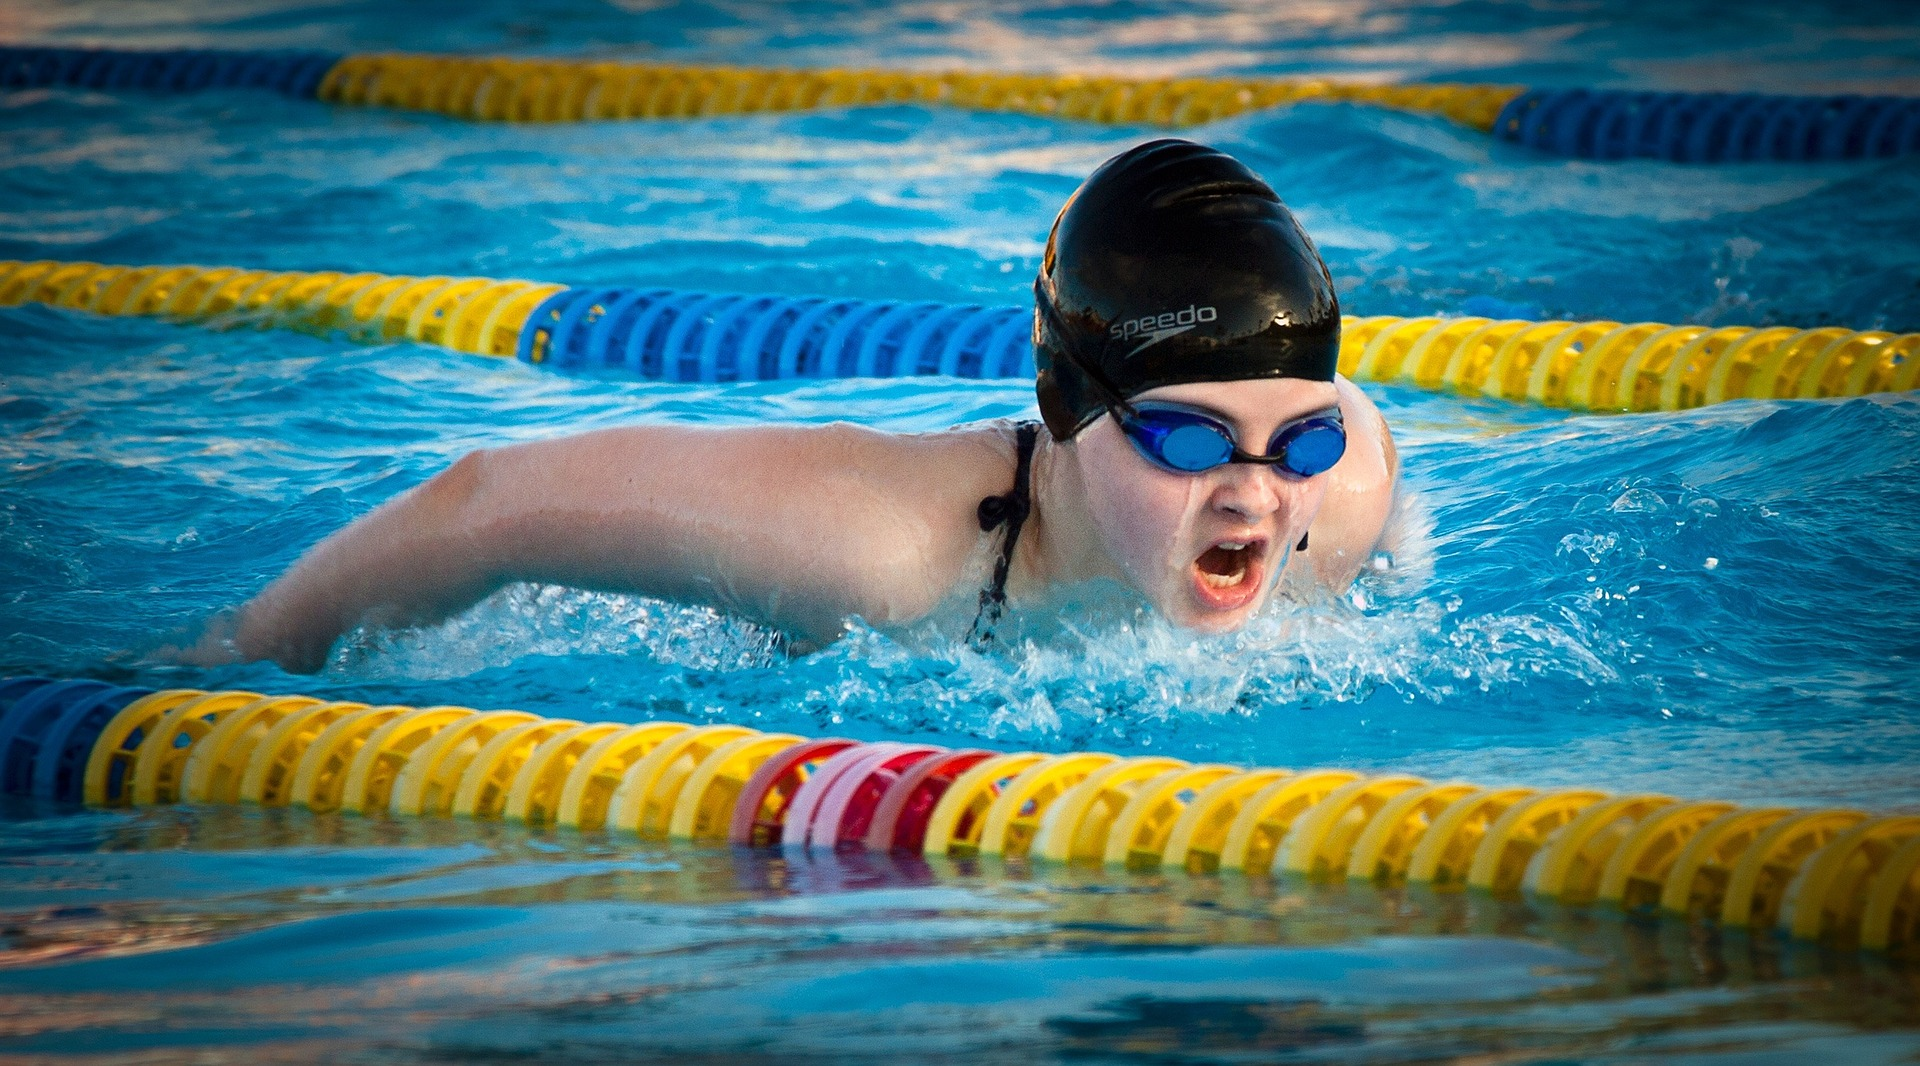 Nageuse dans une piscine